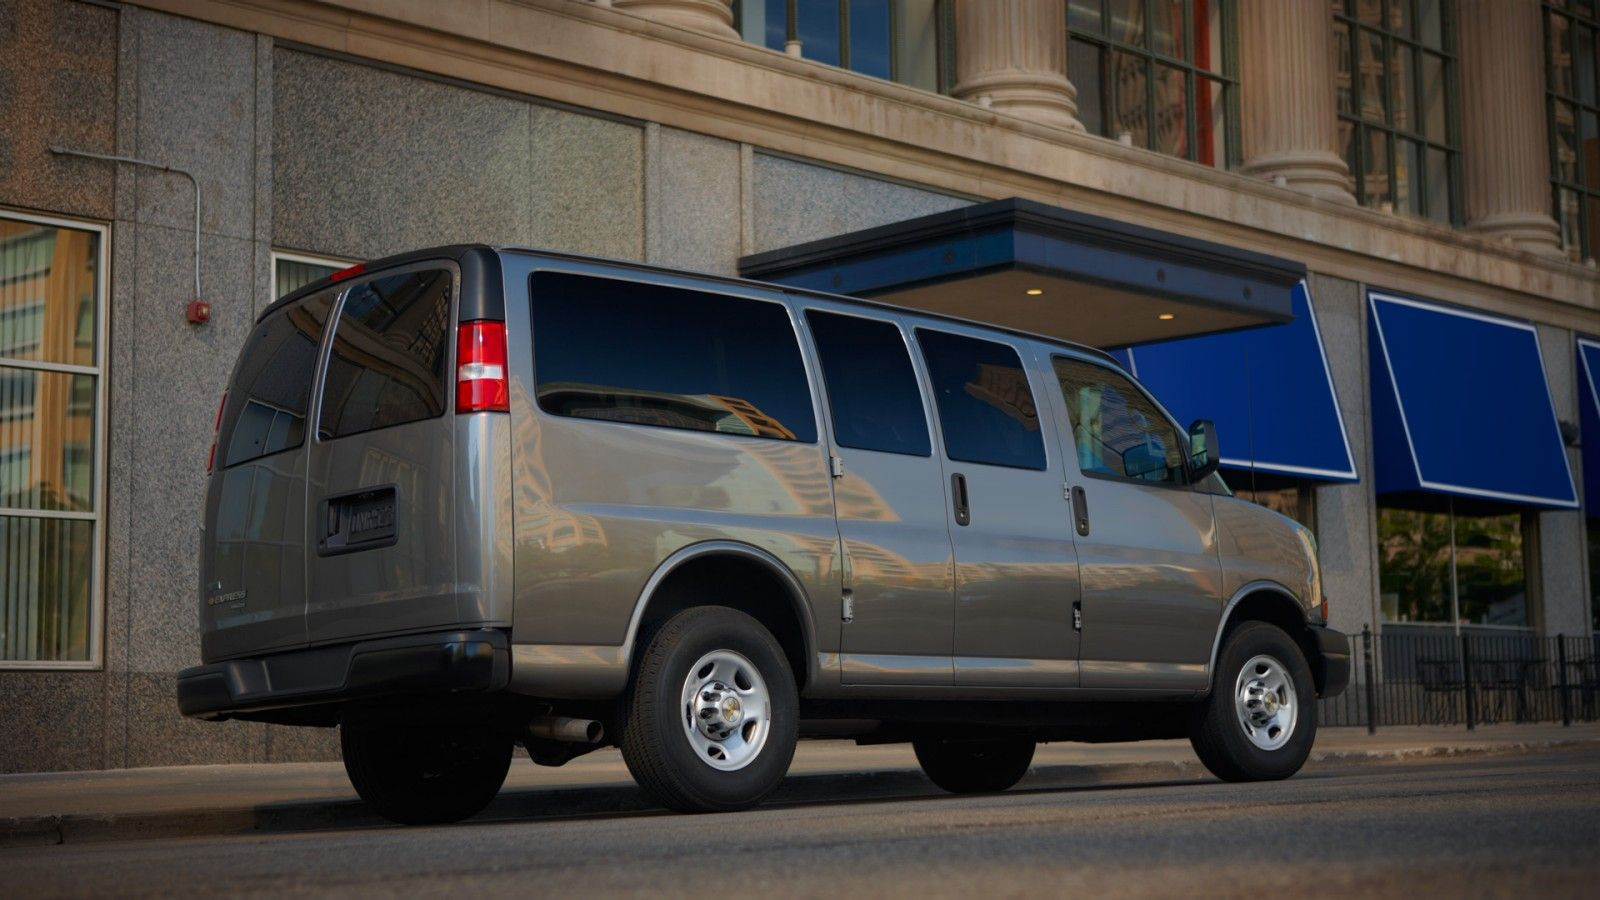 hight resolution of chevy express 3500 passenger van in graystone metallic